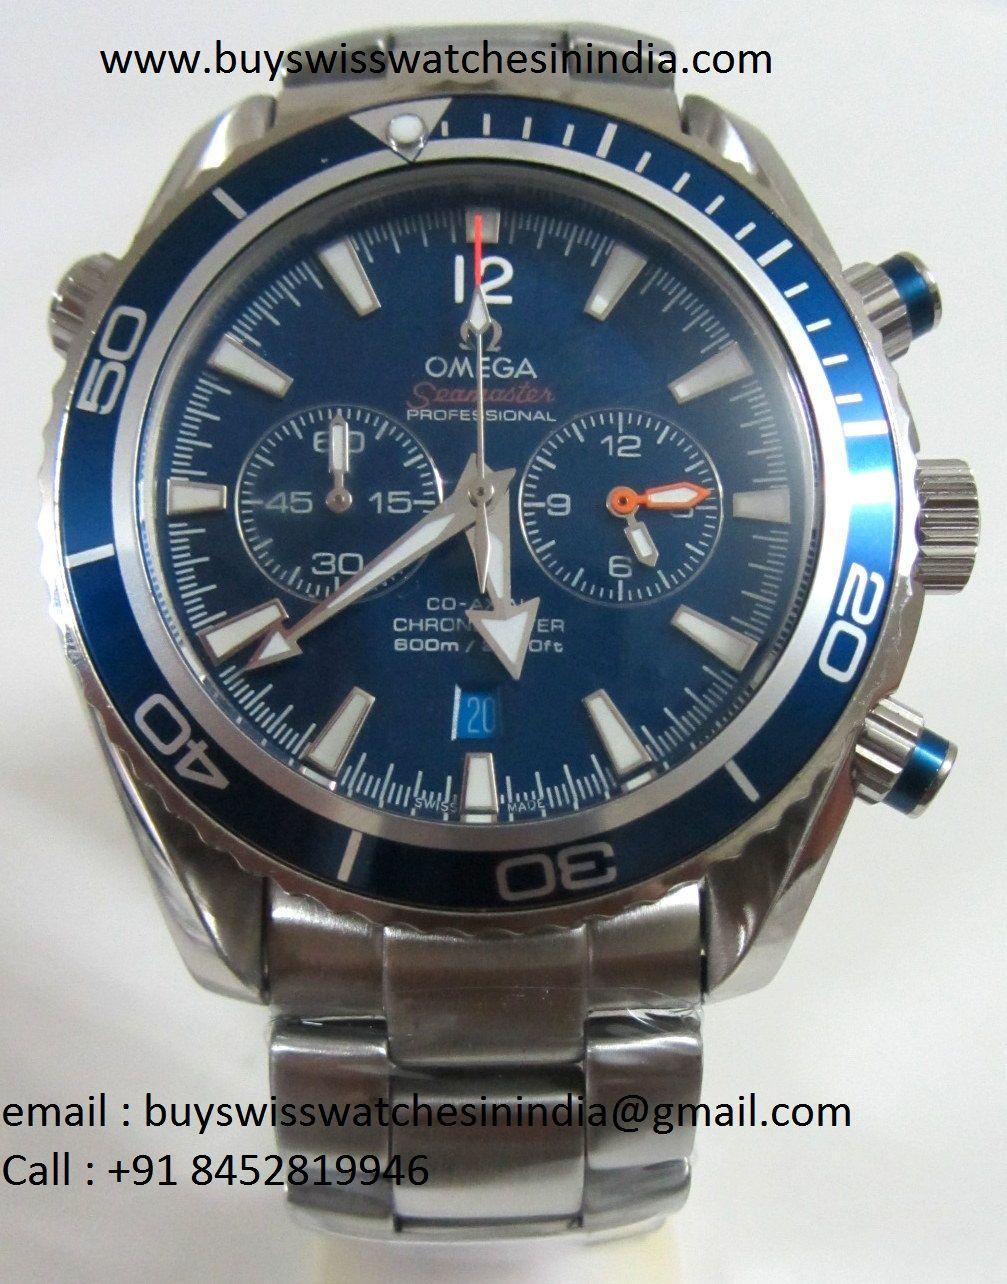 Omega first copy watch in india omega replica watch in kolkata omega replica watch